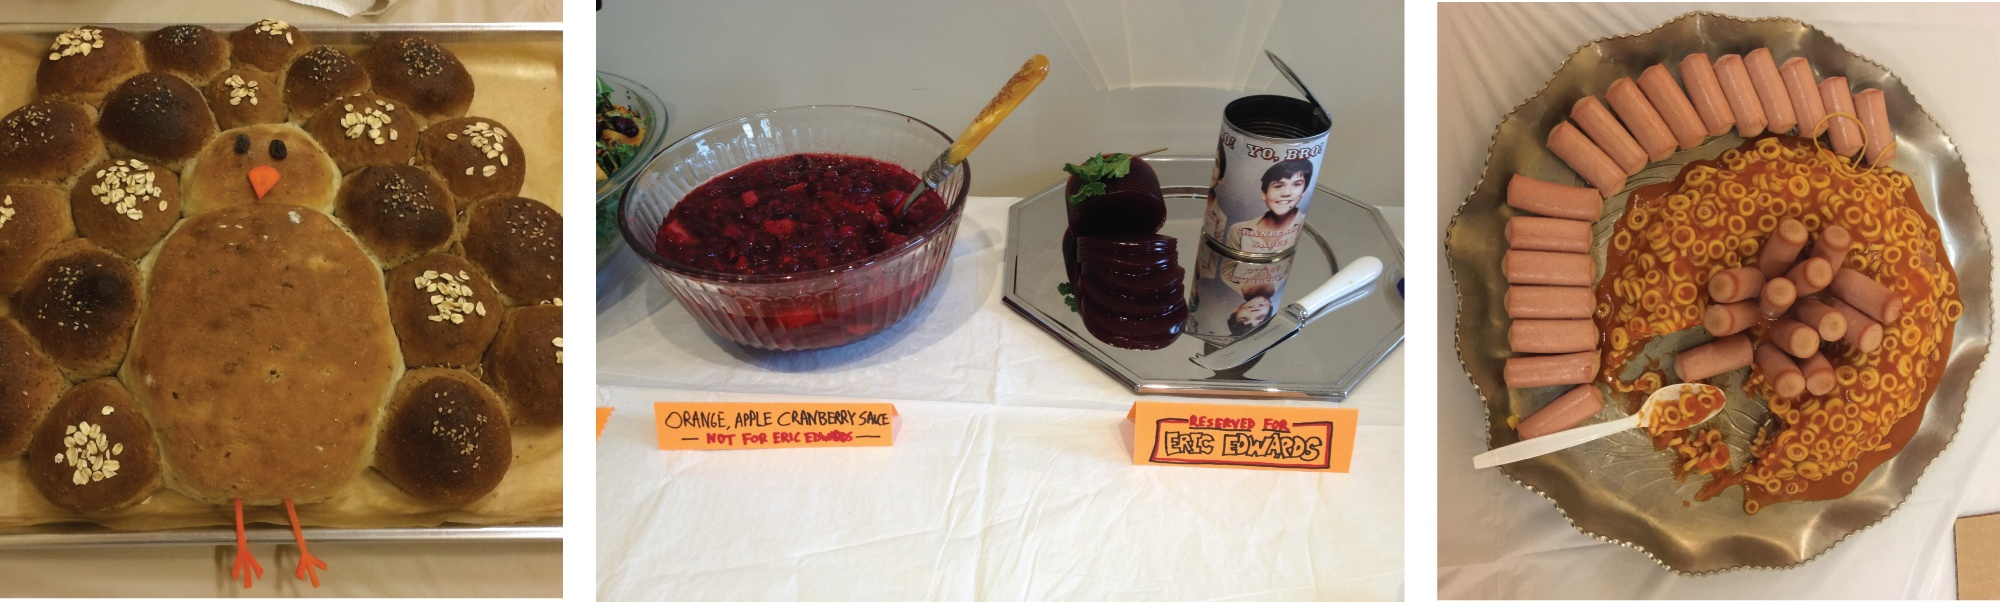 Thanksploration-History-of-Dishes-Blog-Image